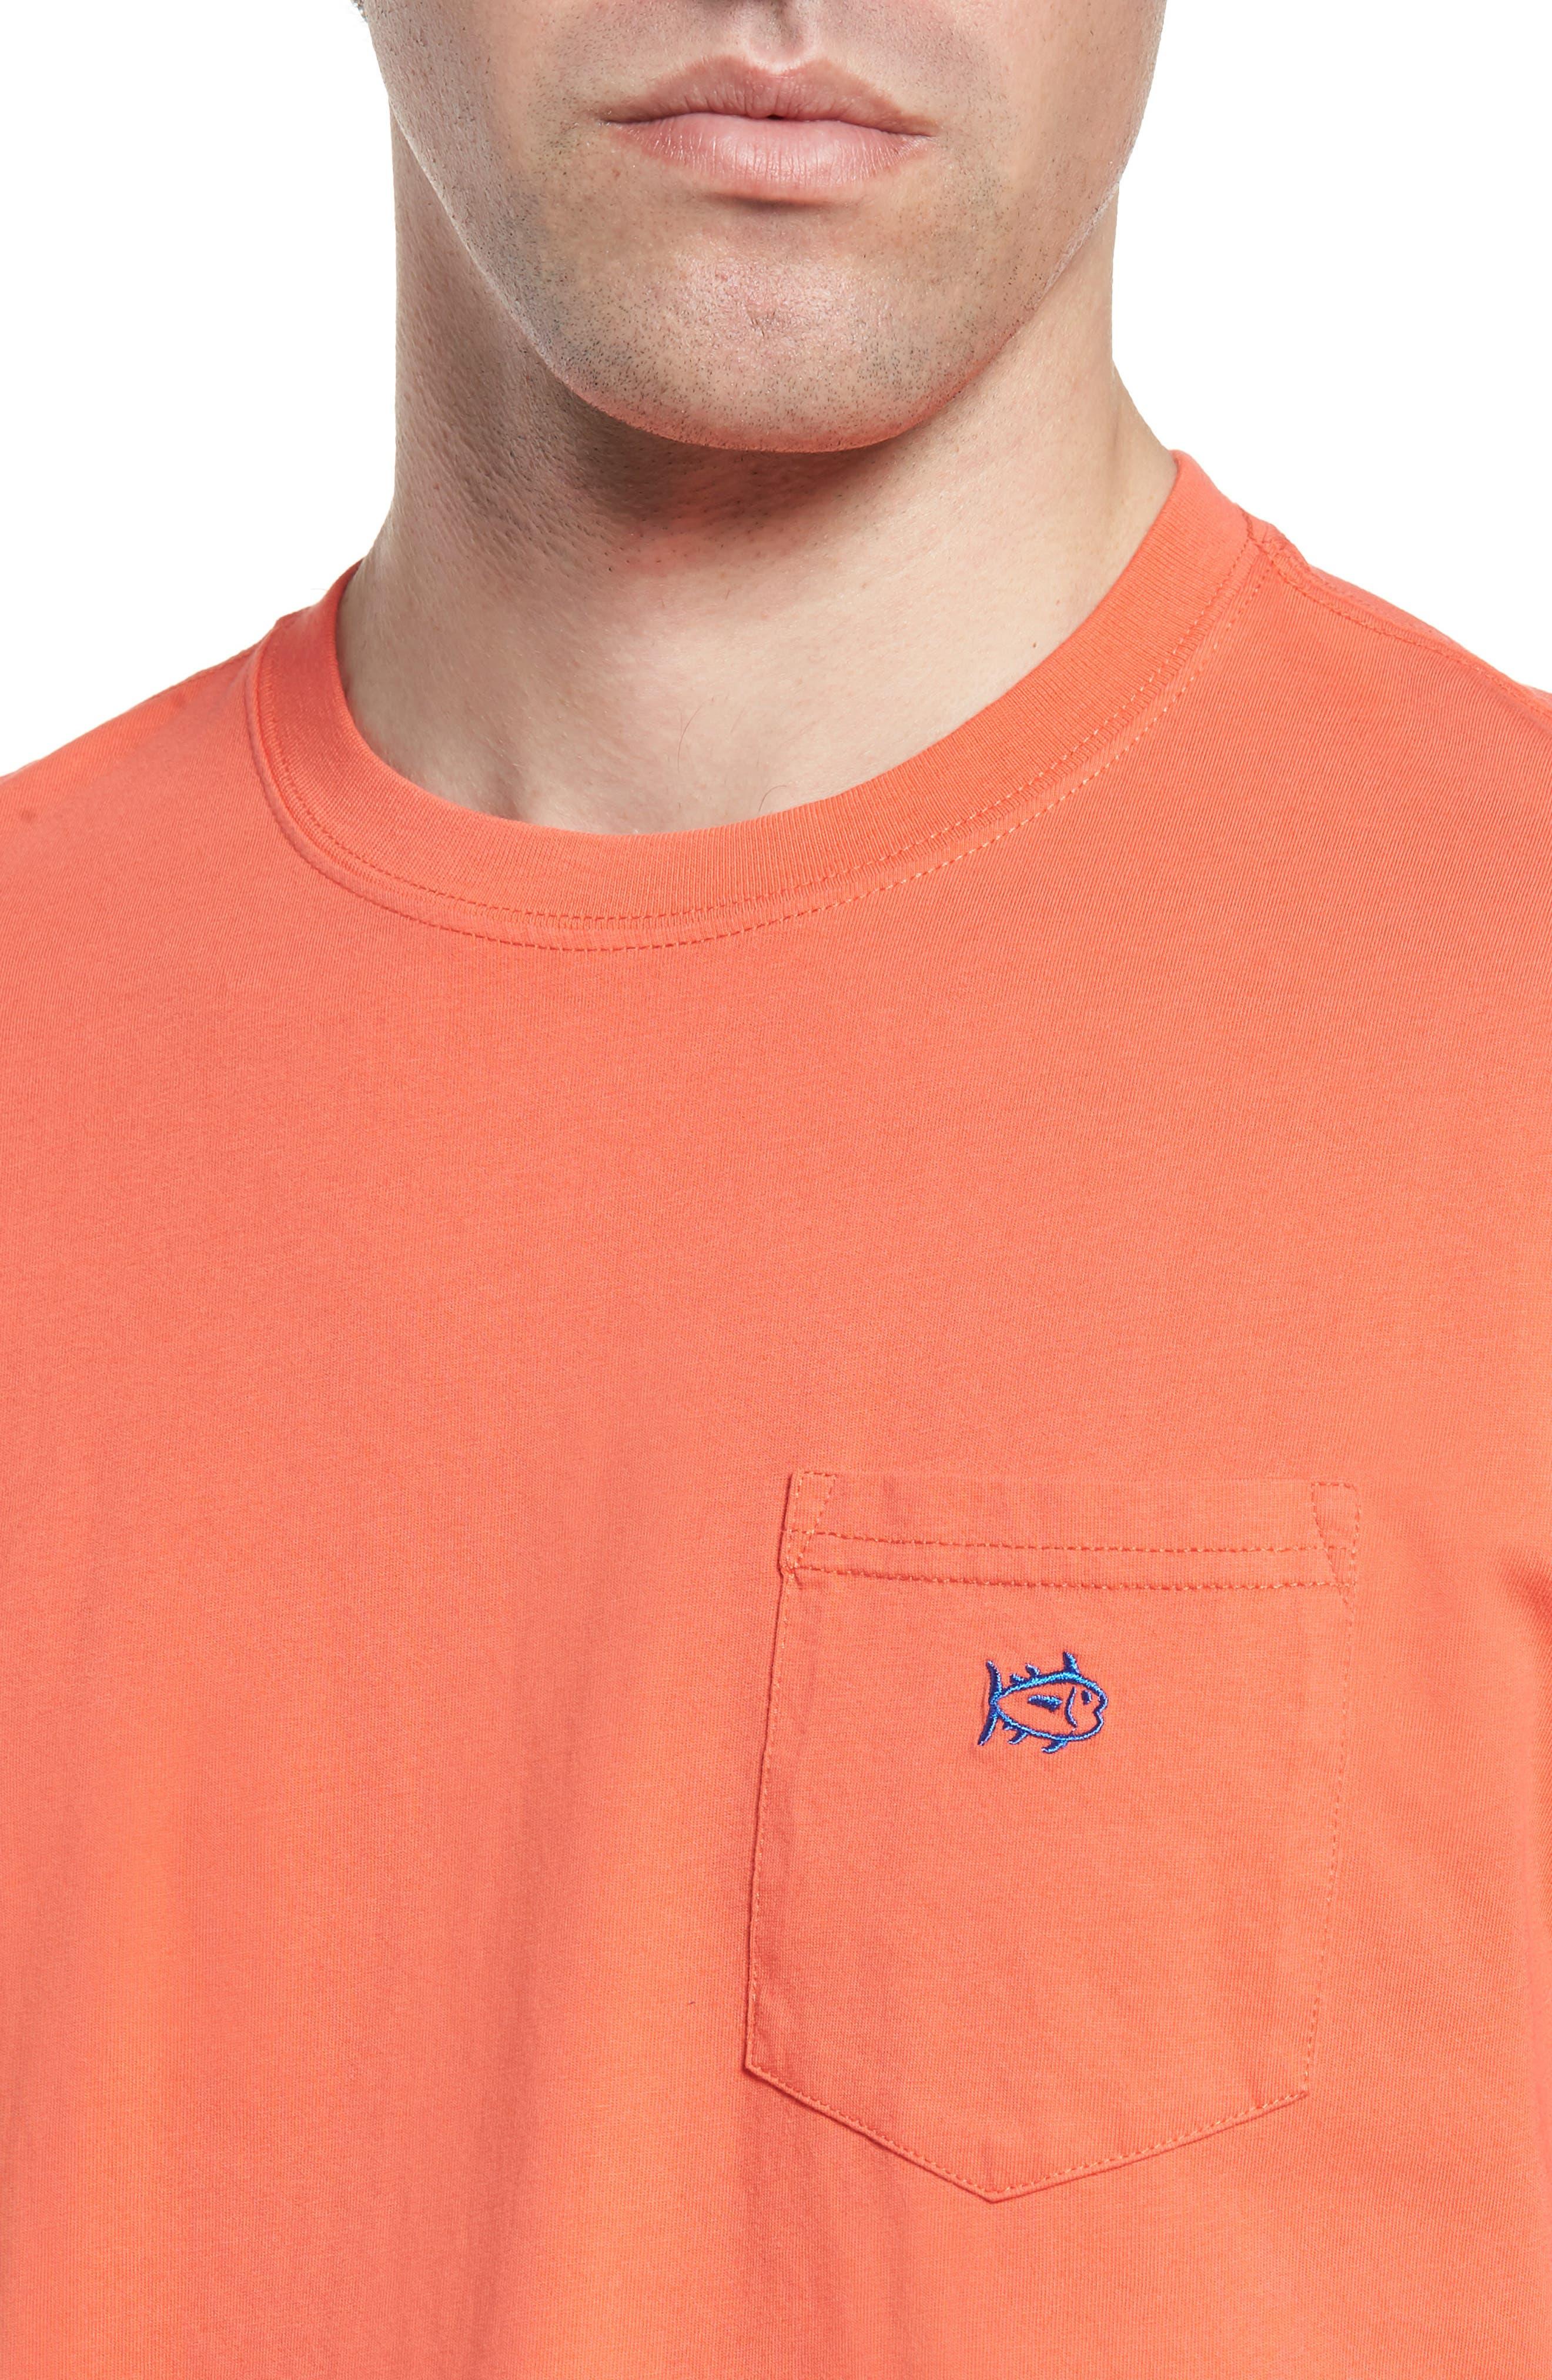 Skipjack Logo Regular Fit T-Shirt,                             Alternate thumbnail 4, color,                             Hot Coral